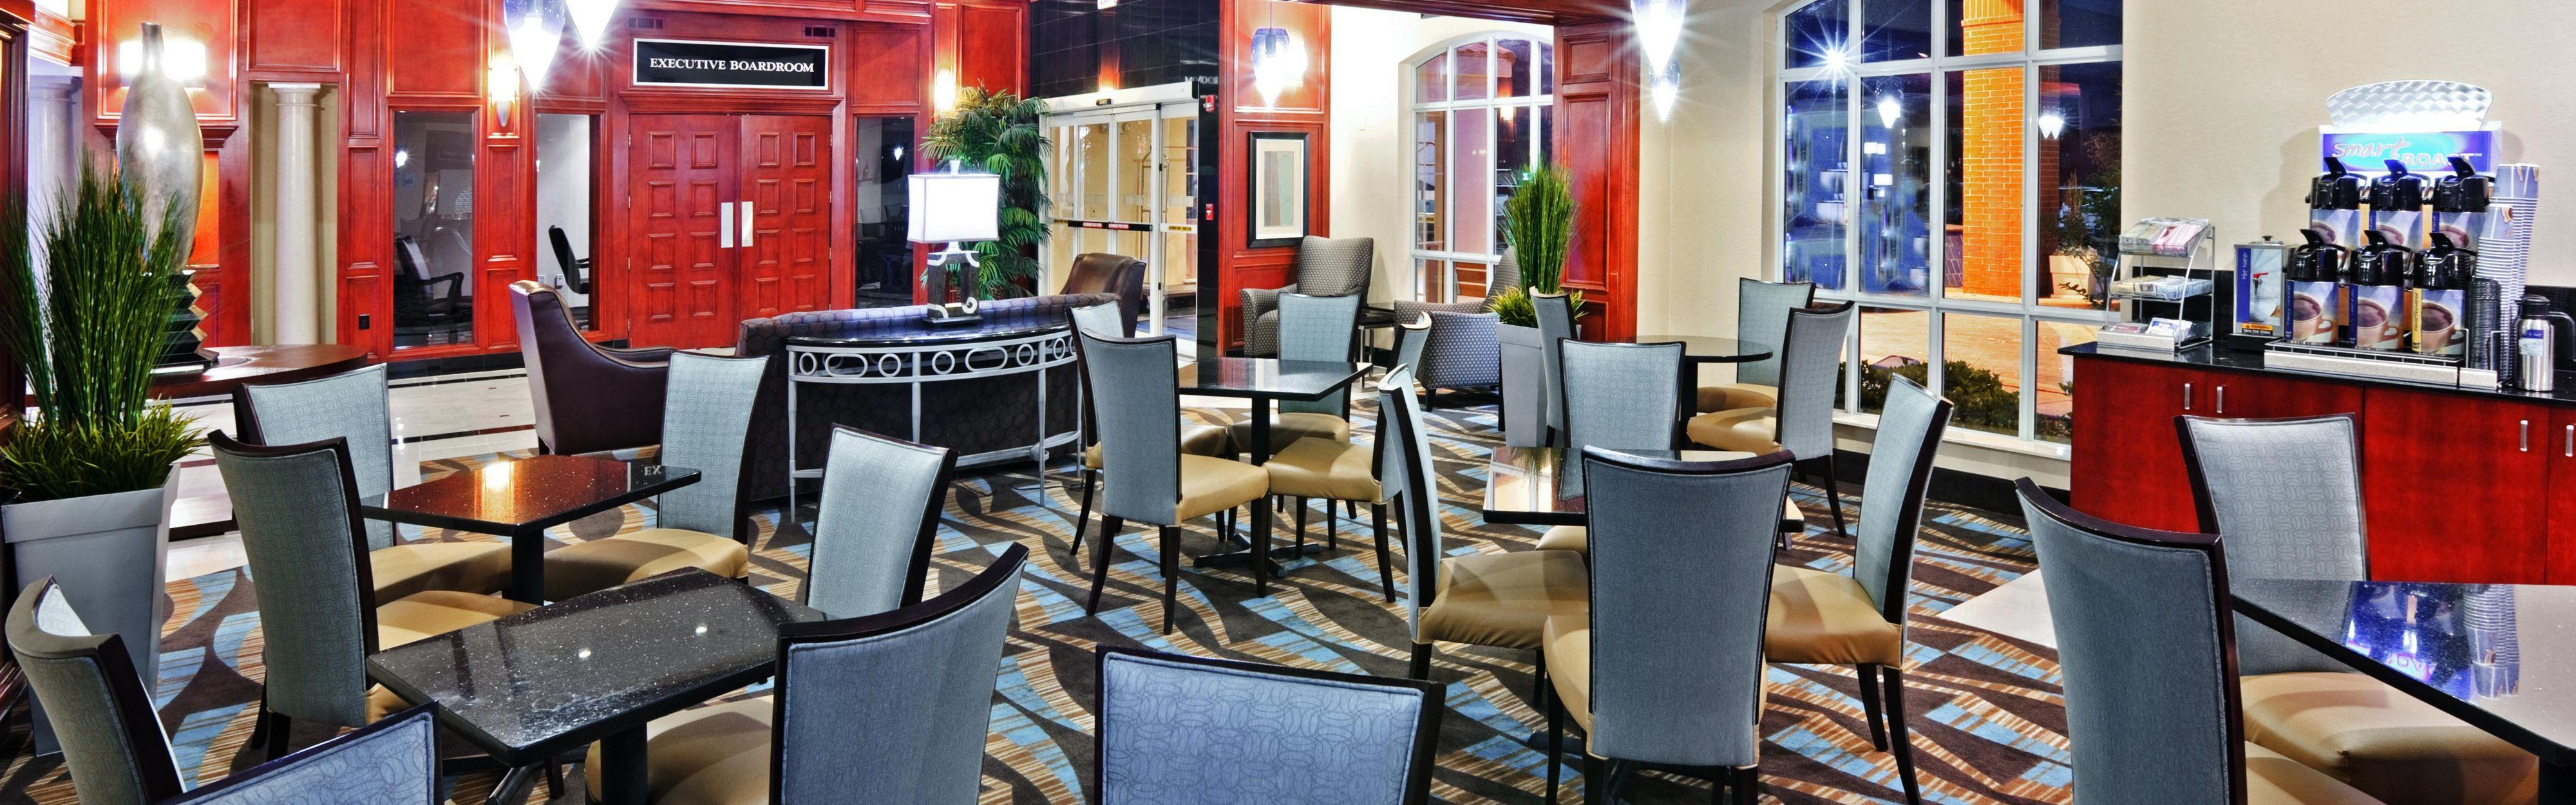 Holiday Inn Express & Suites Oklahoma City-Penn Square image 3